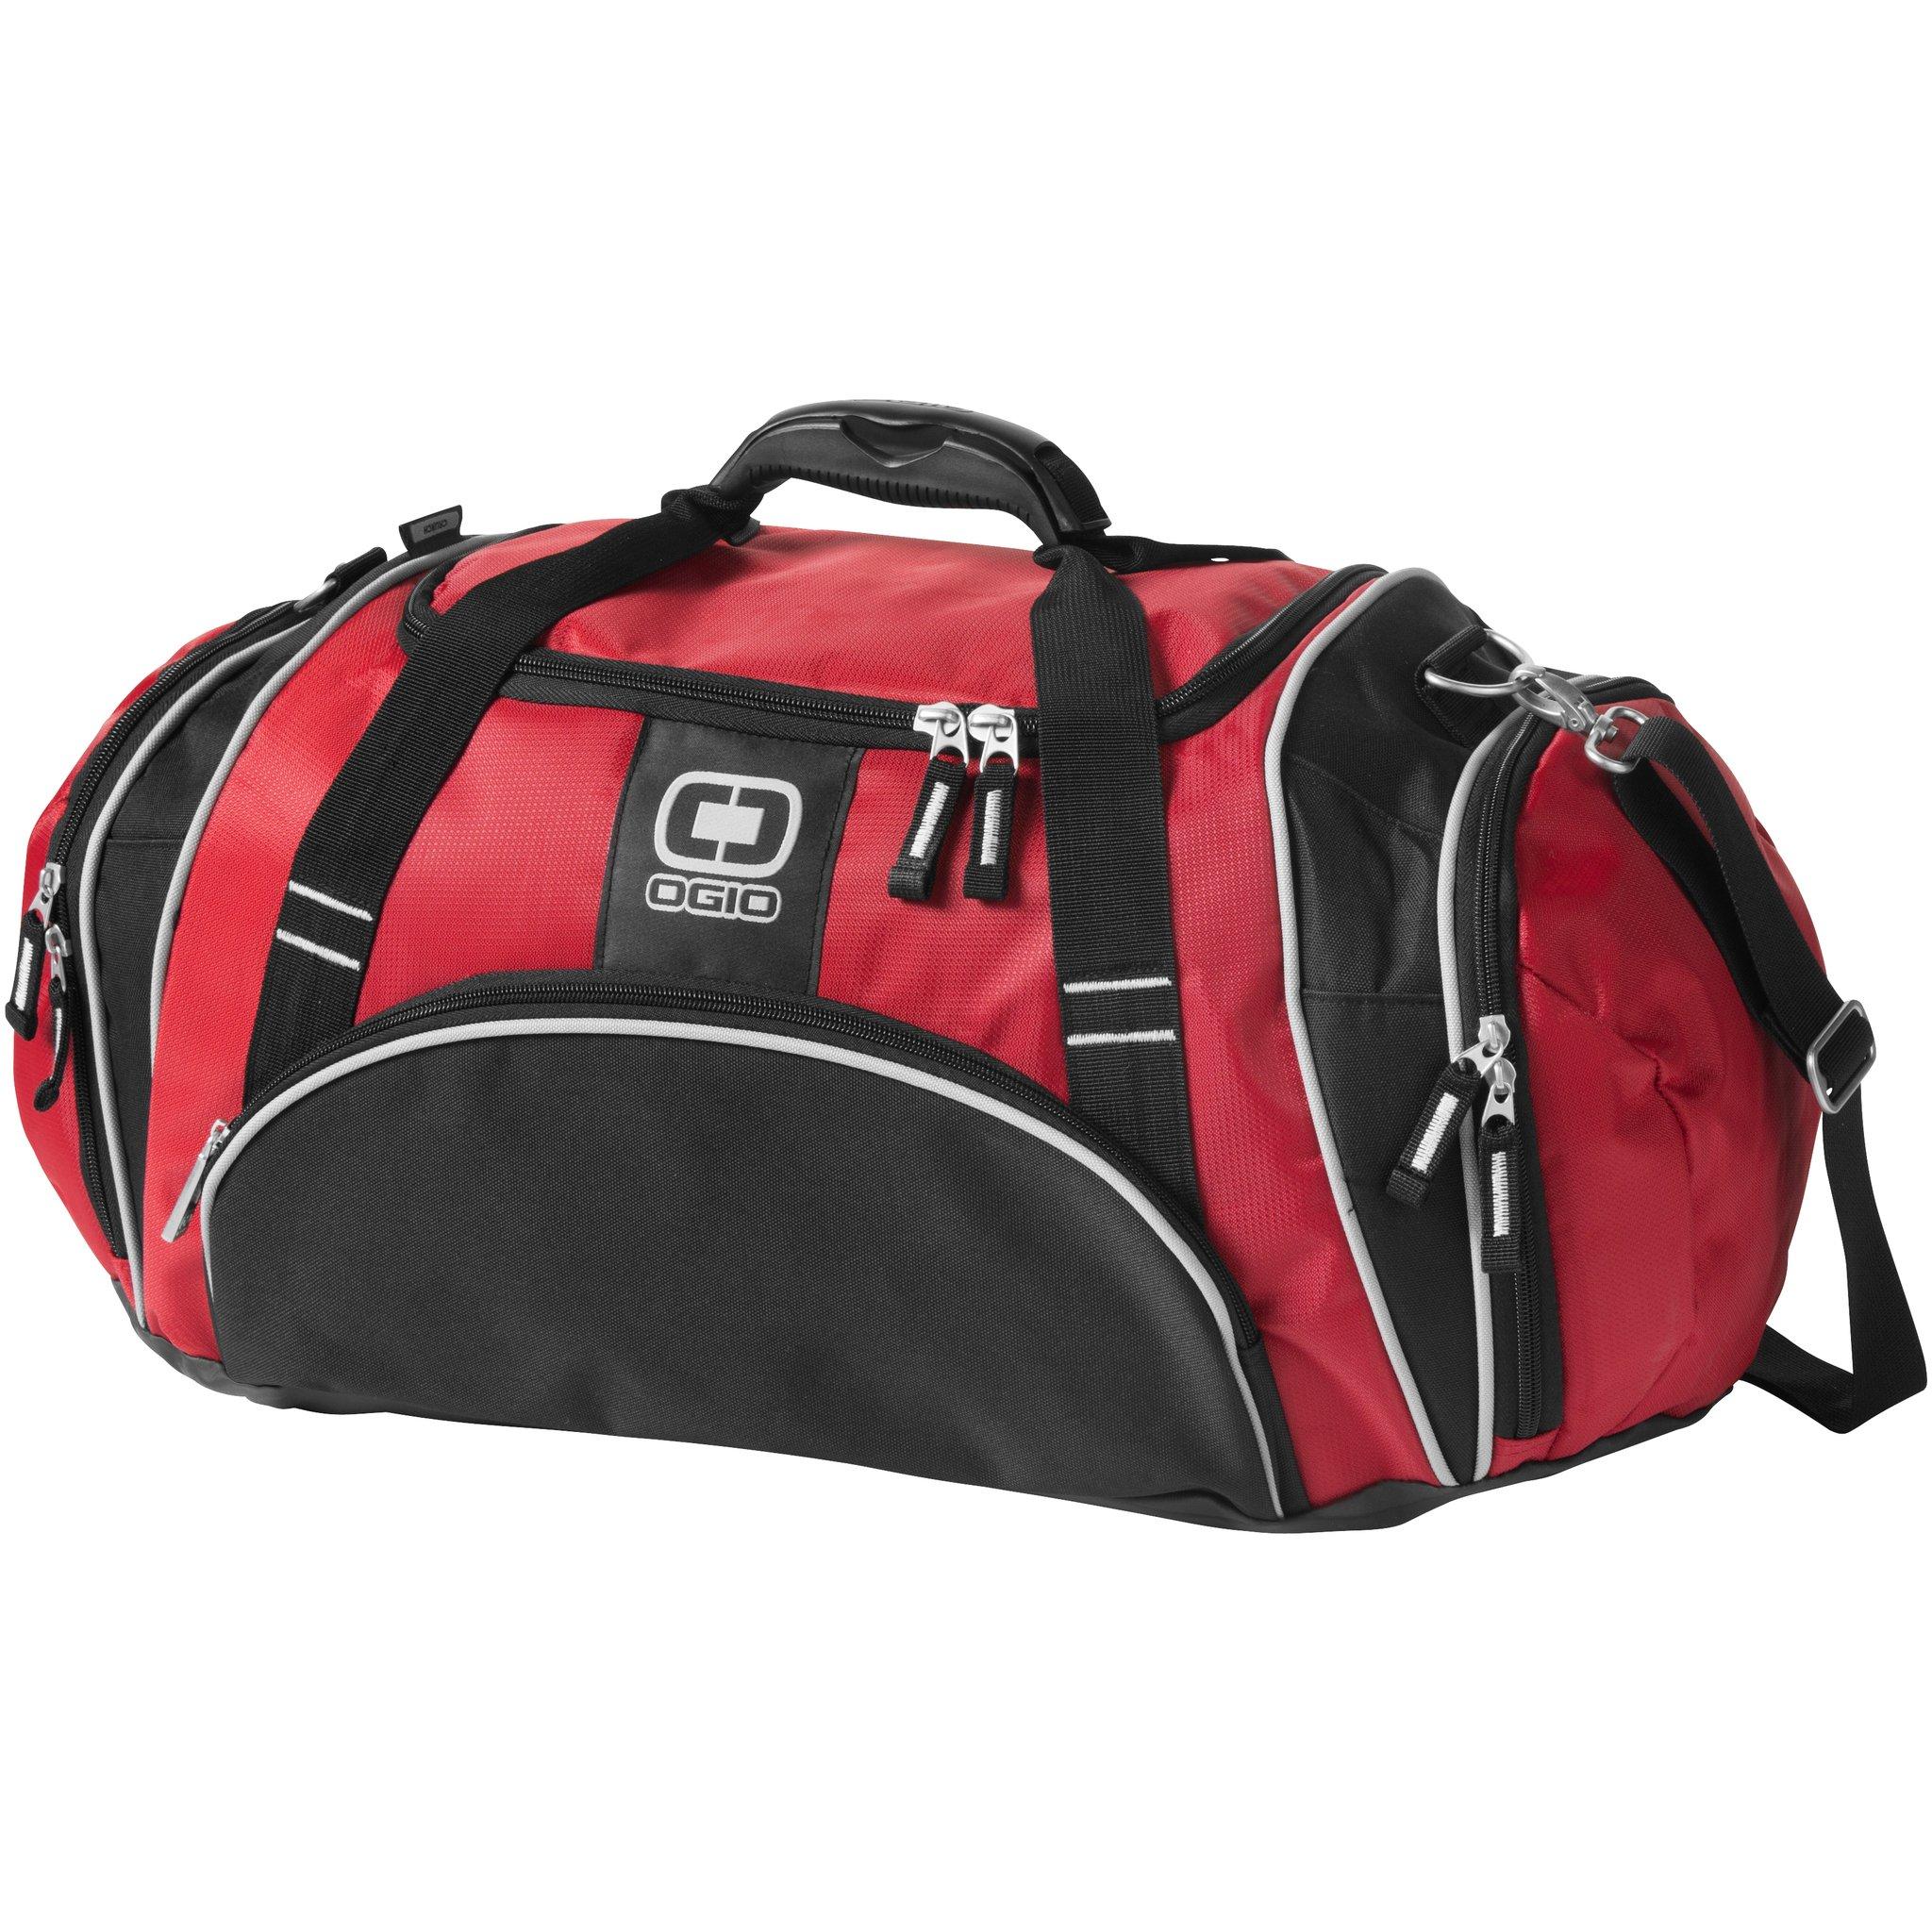 Ogio Crunch Duffel Bag (23.6 x 10 x 13 inches) (Red)